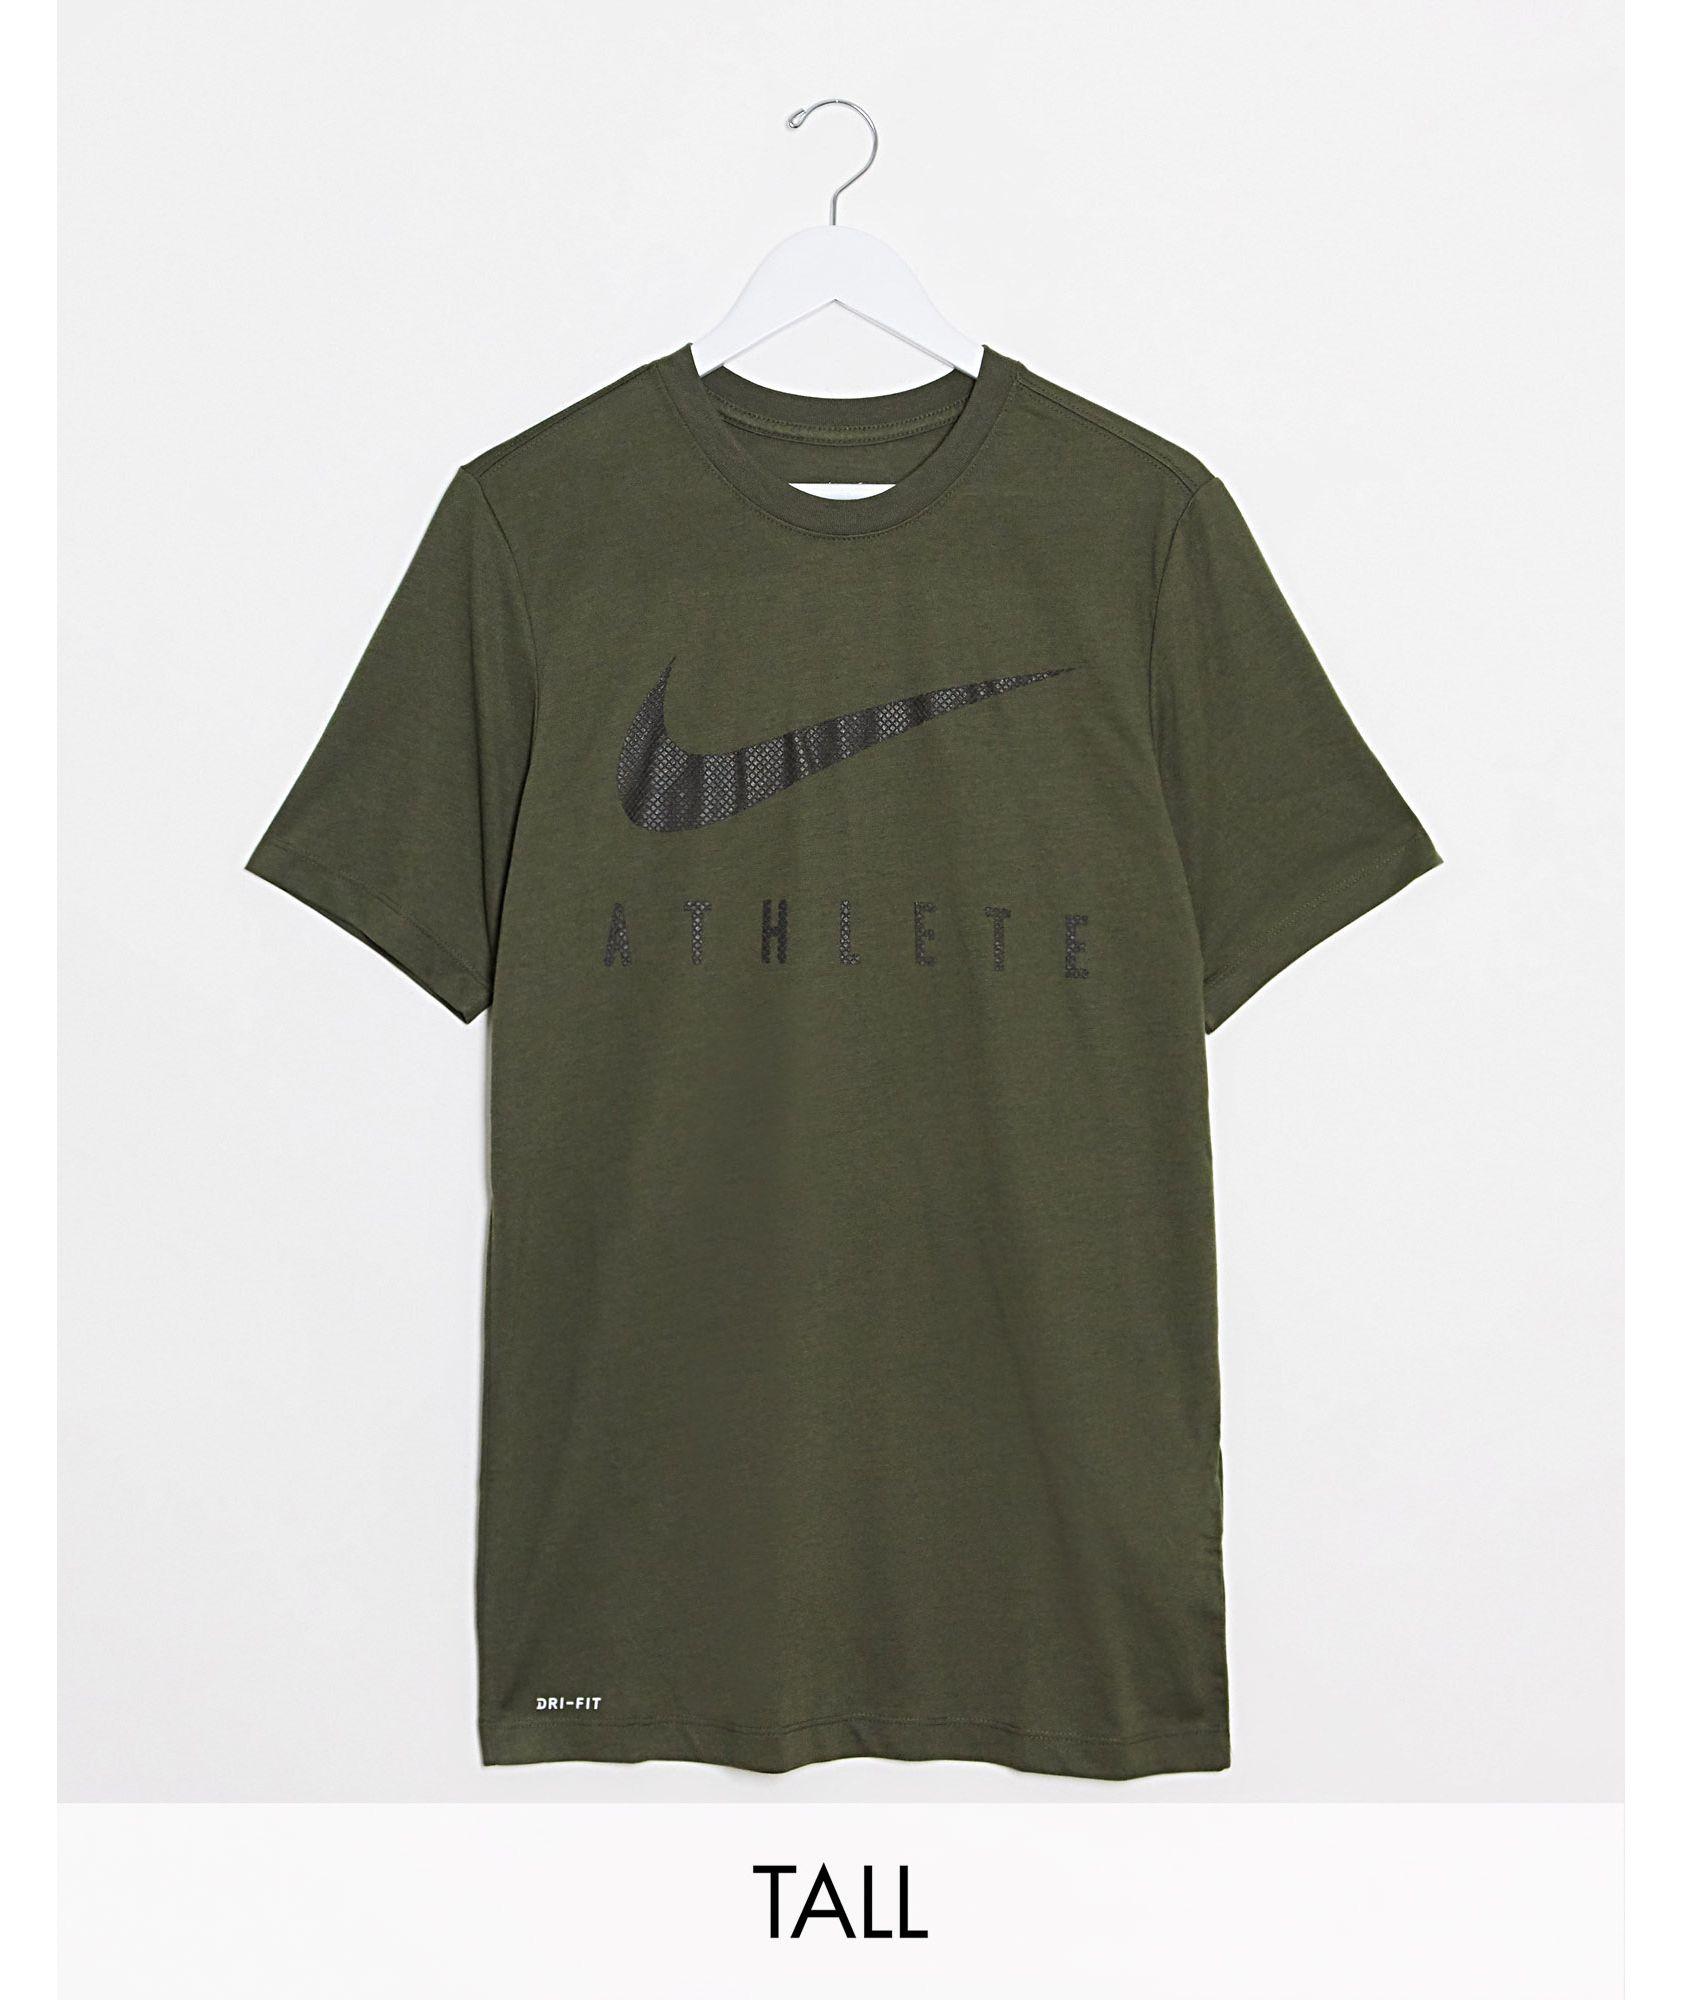 Nike Training Tall athlete swoosh t-shirt in khaki - ASOS Price Checker